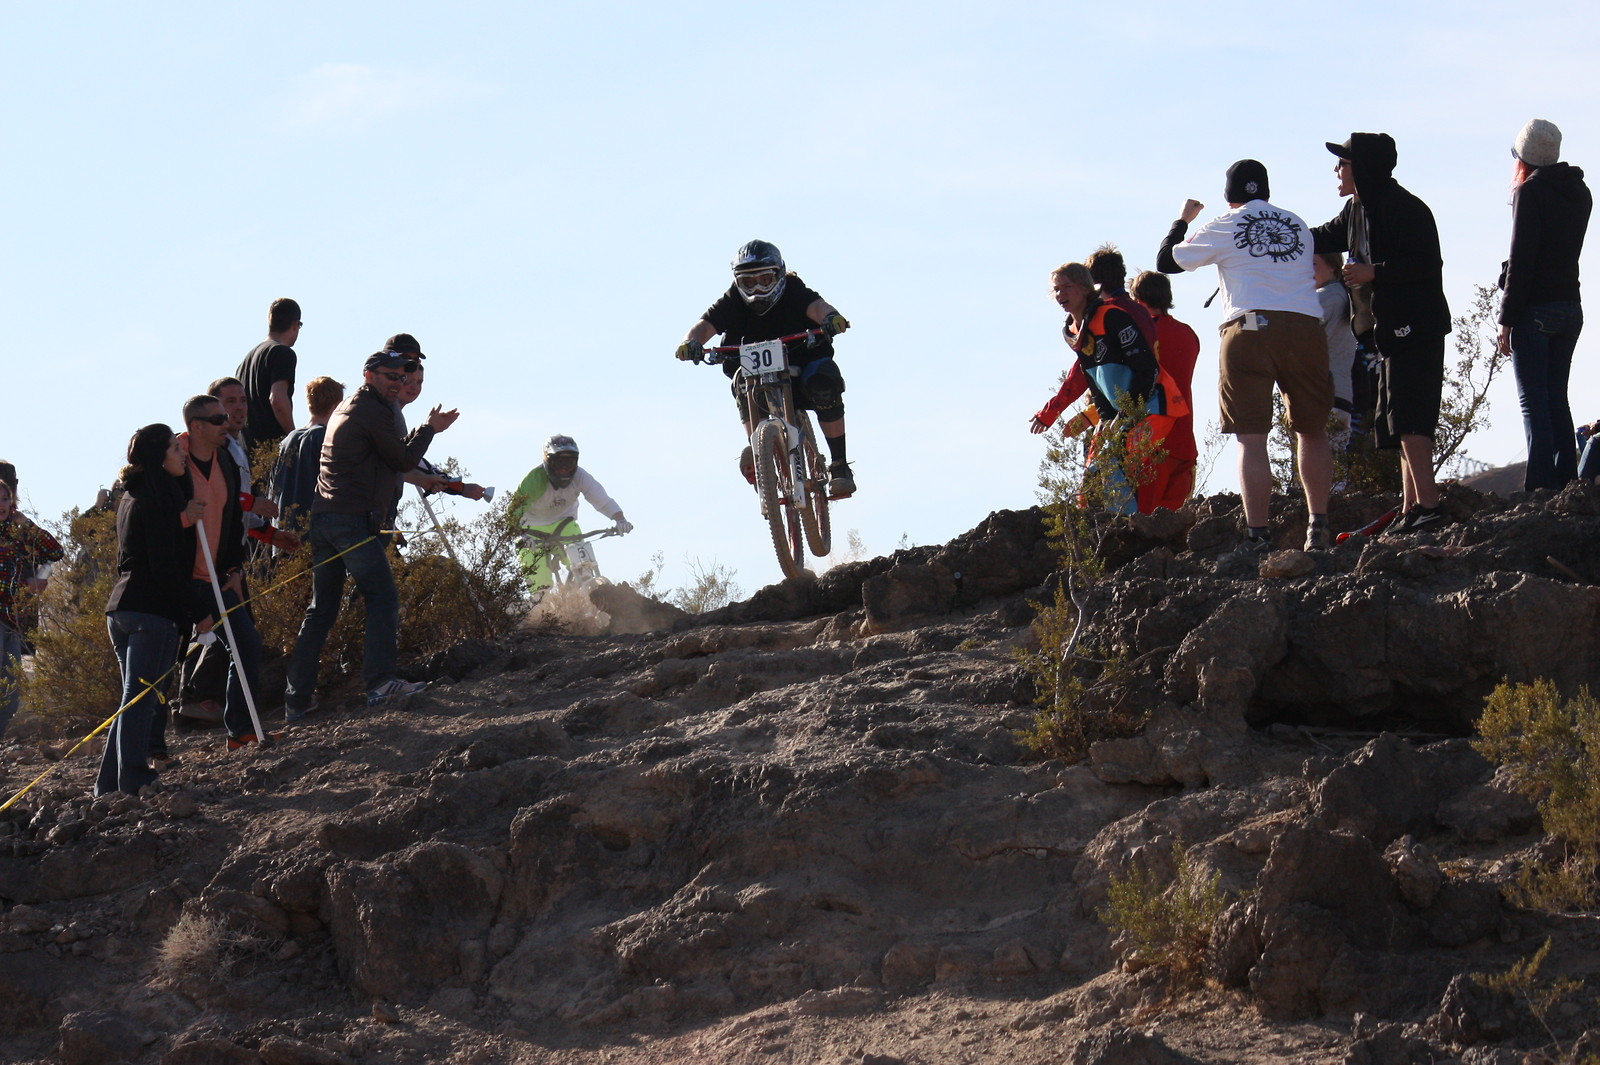 IMG 0419 - DHmental - Mountain Biking Pictures - Vital MTB